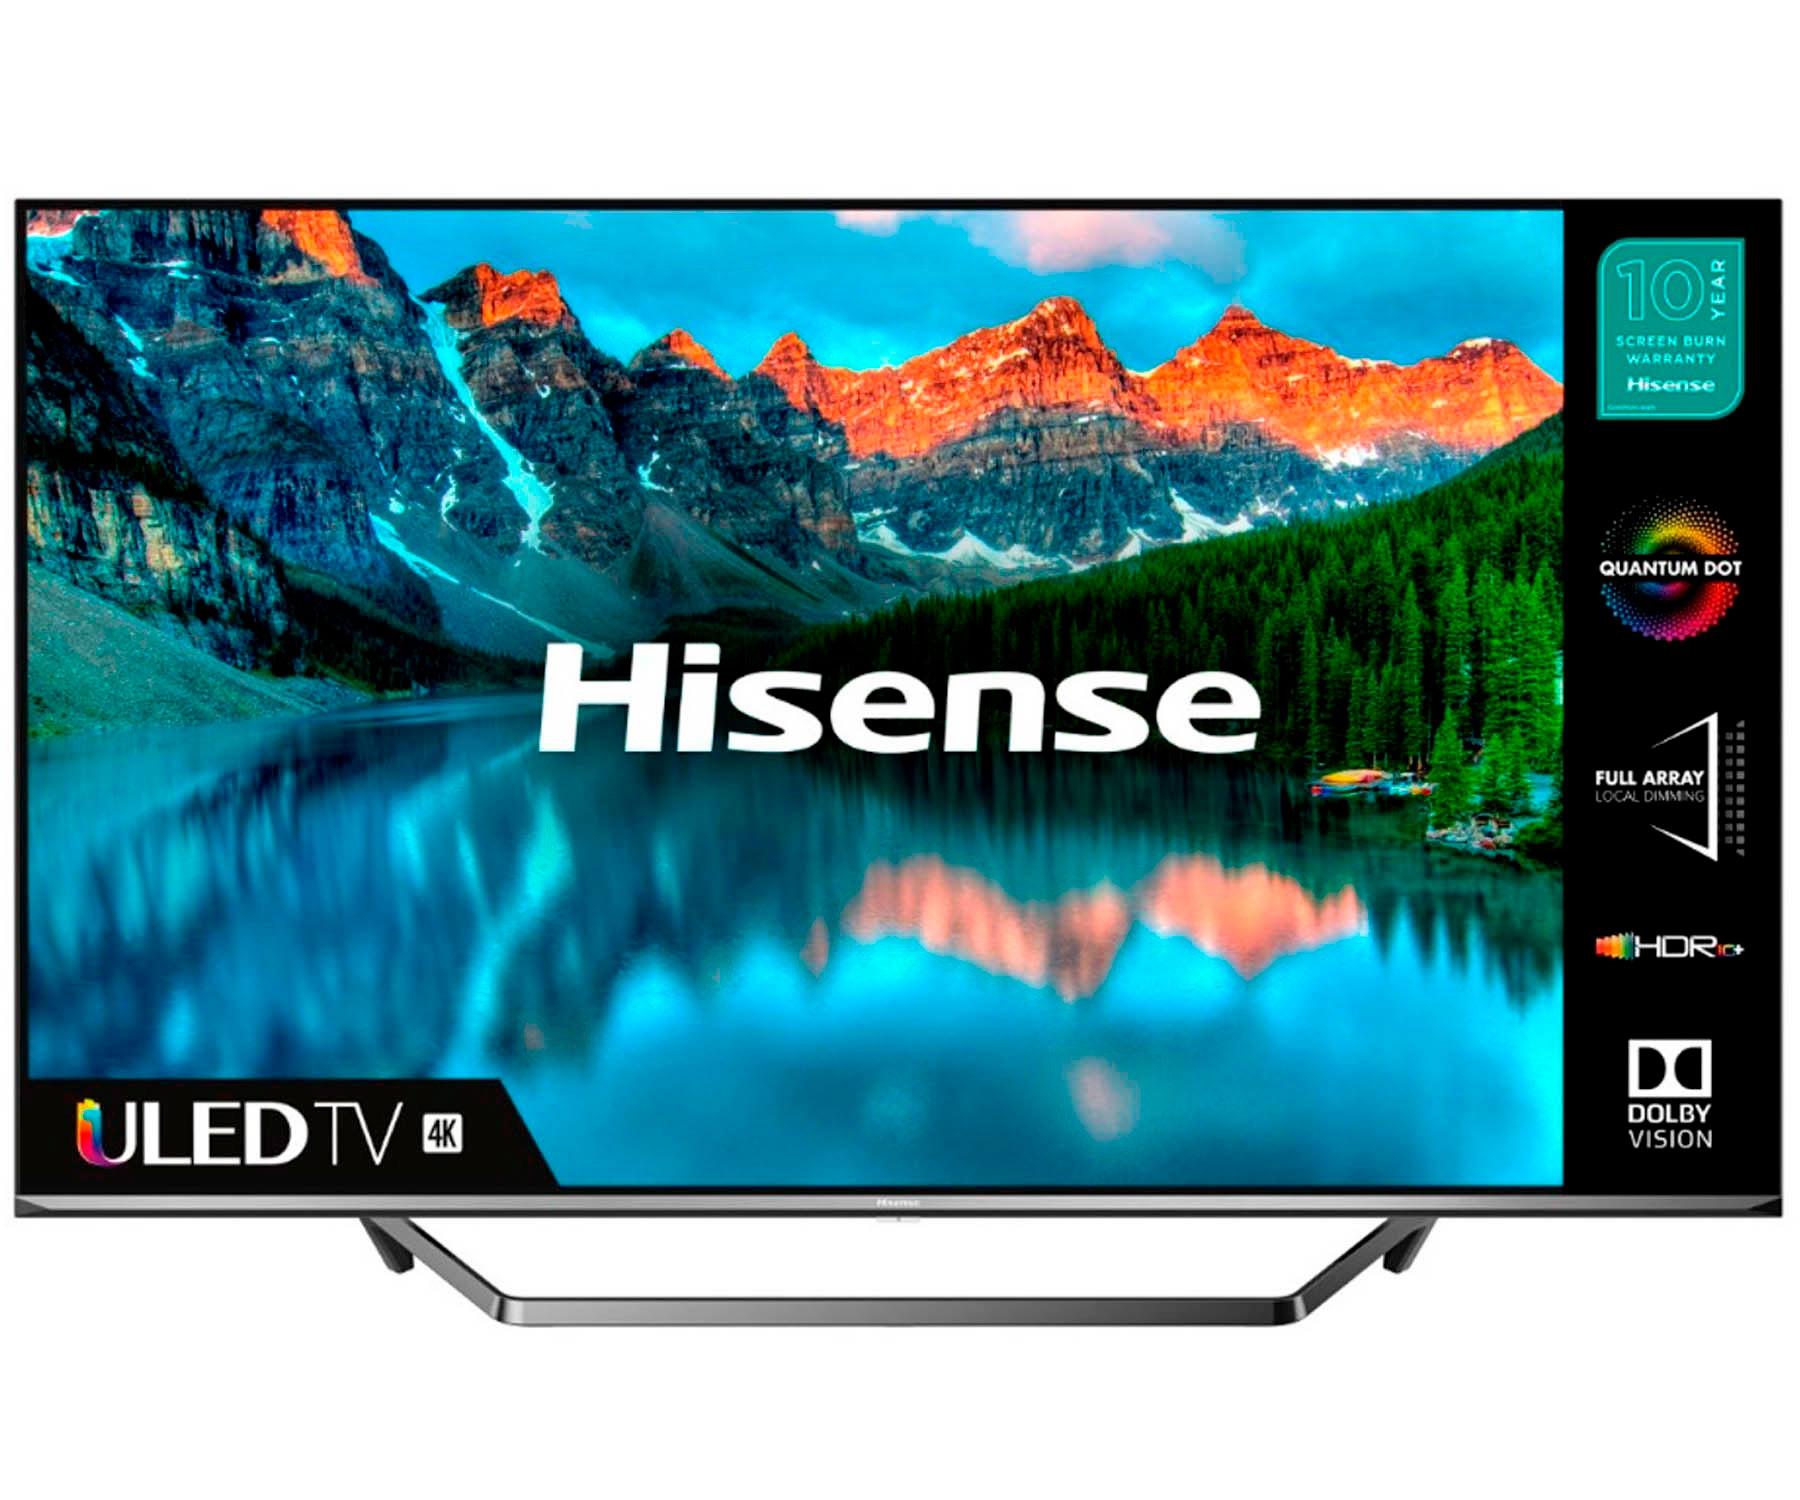 Hisense h50u7qf televisor 50`` smart tv